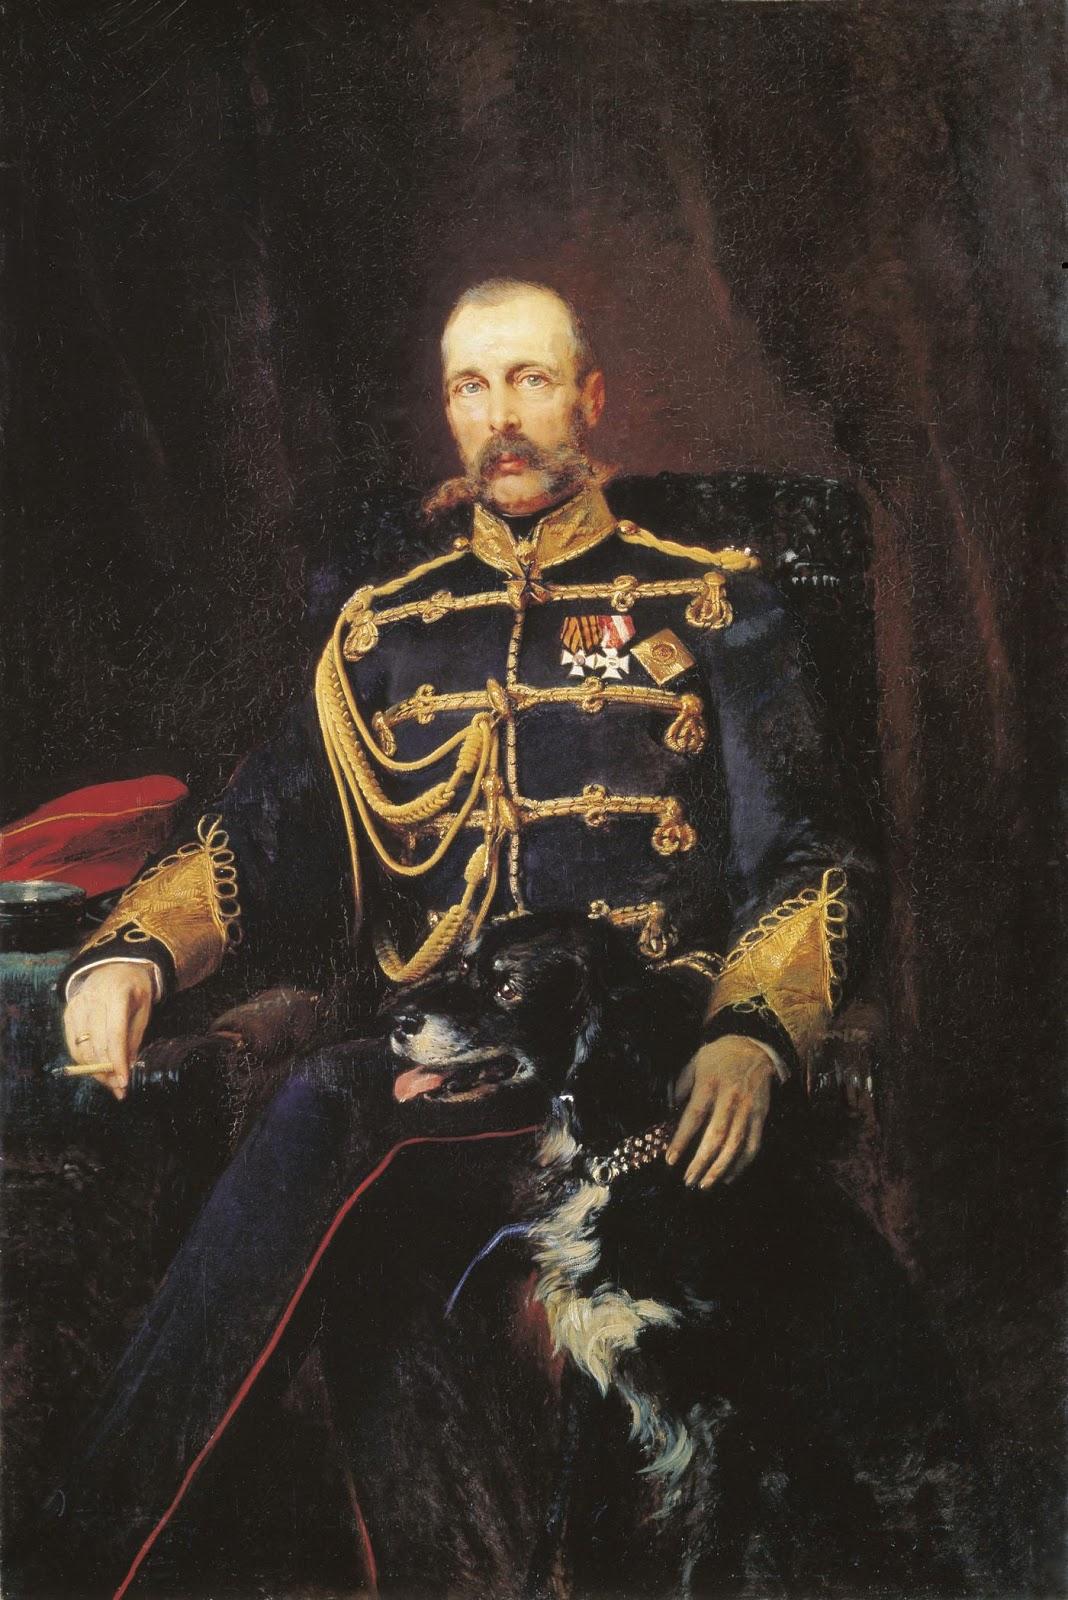 Judicial reform of Alexander 2. The reforms of Alexander 2 briefly 23